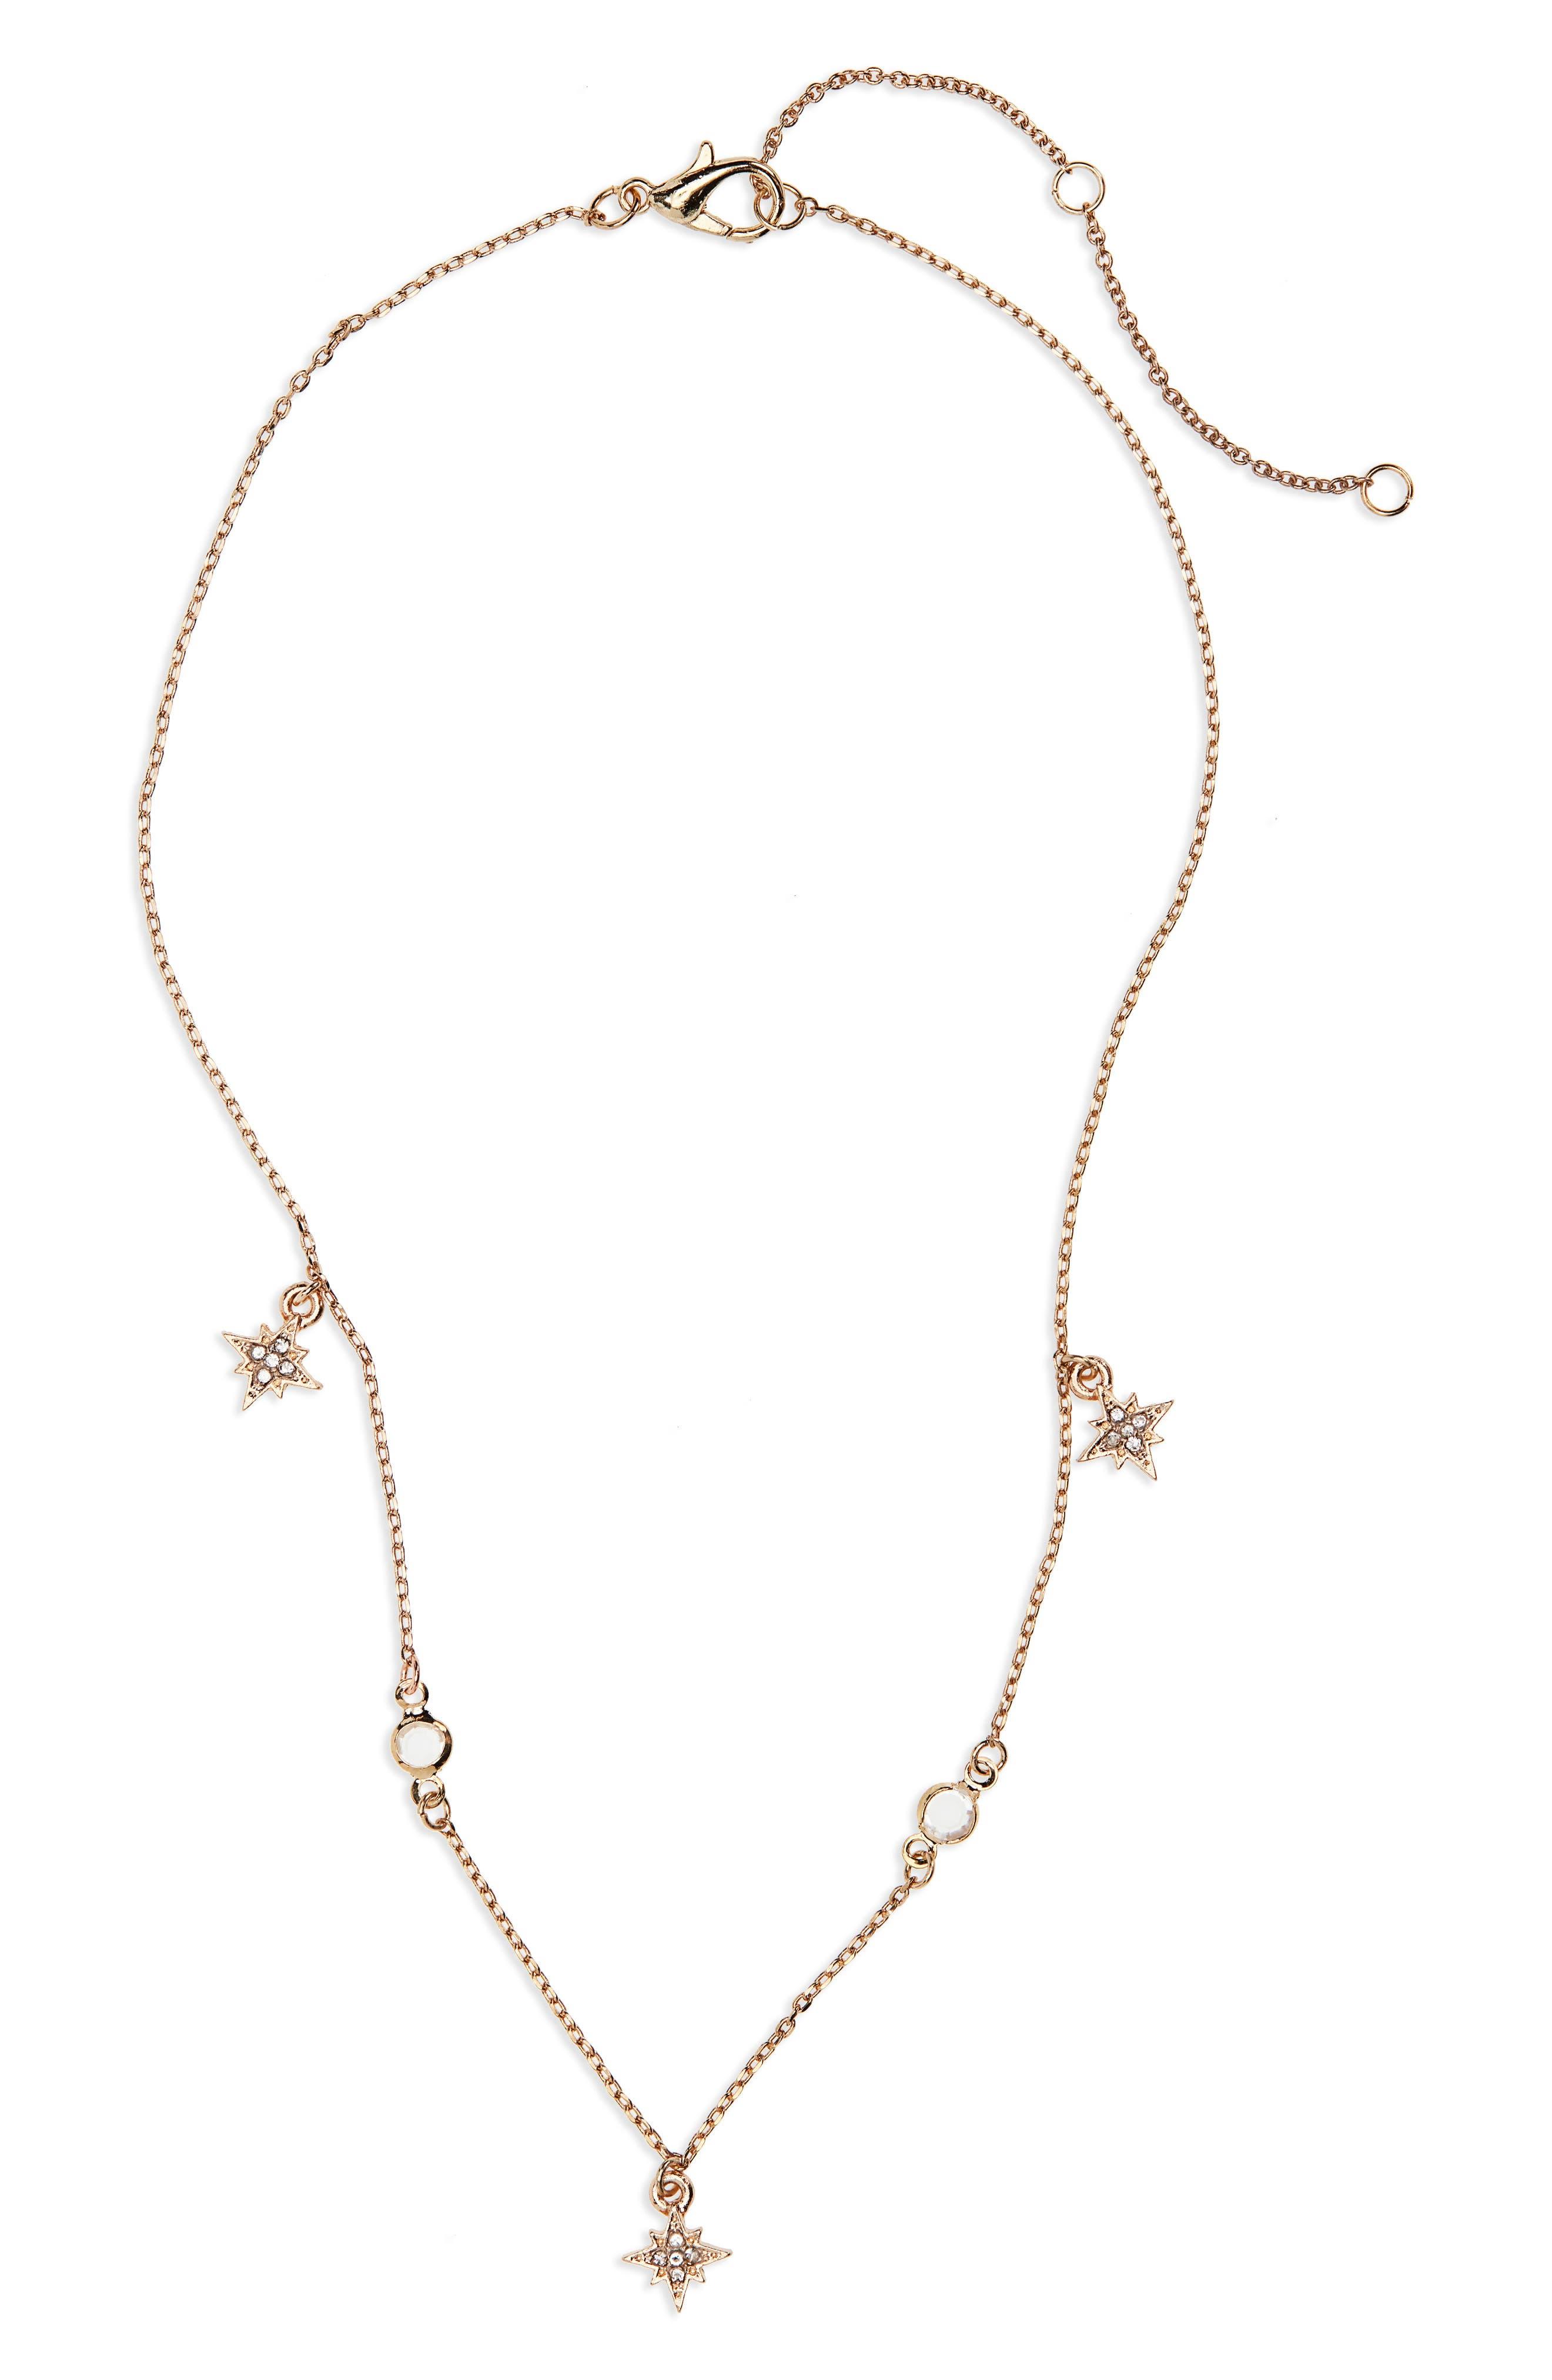 Dainty Star Crystal Necklace,                             Main thumbnail 1, color,                             710